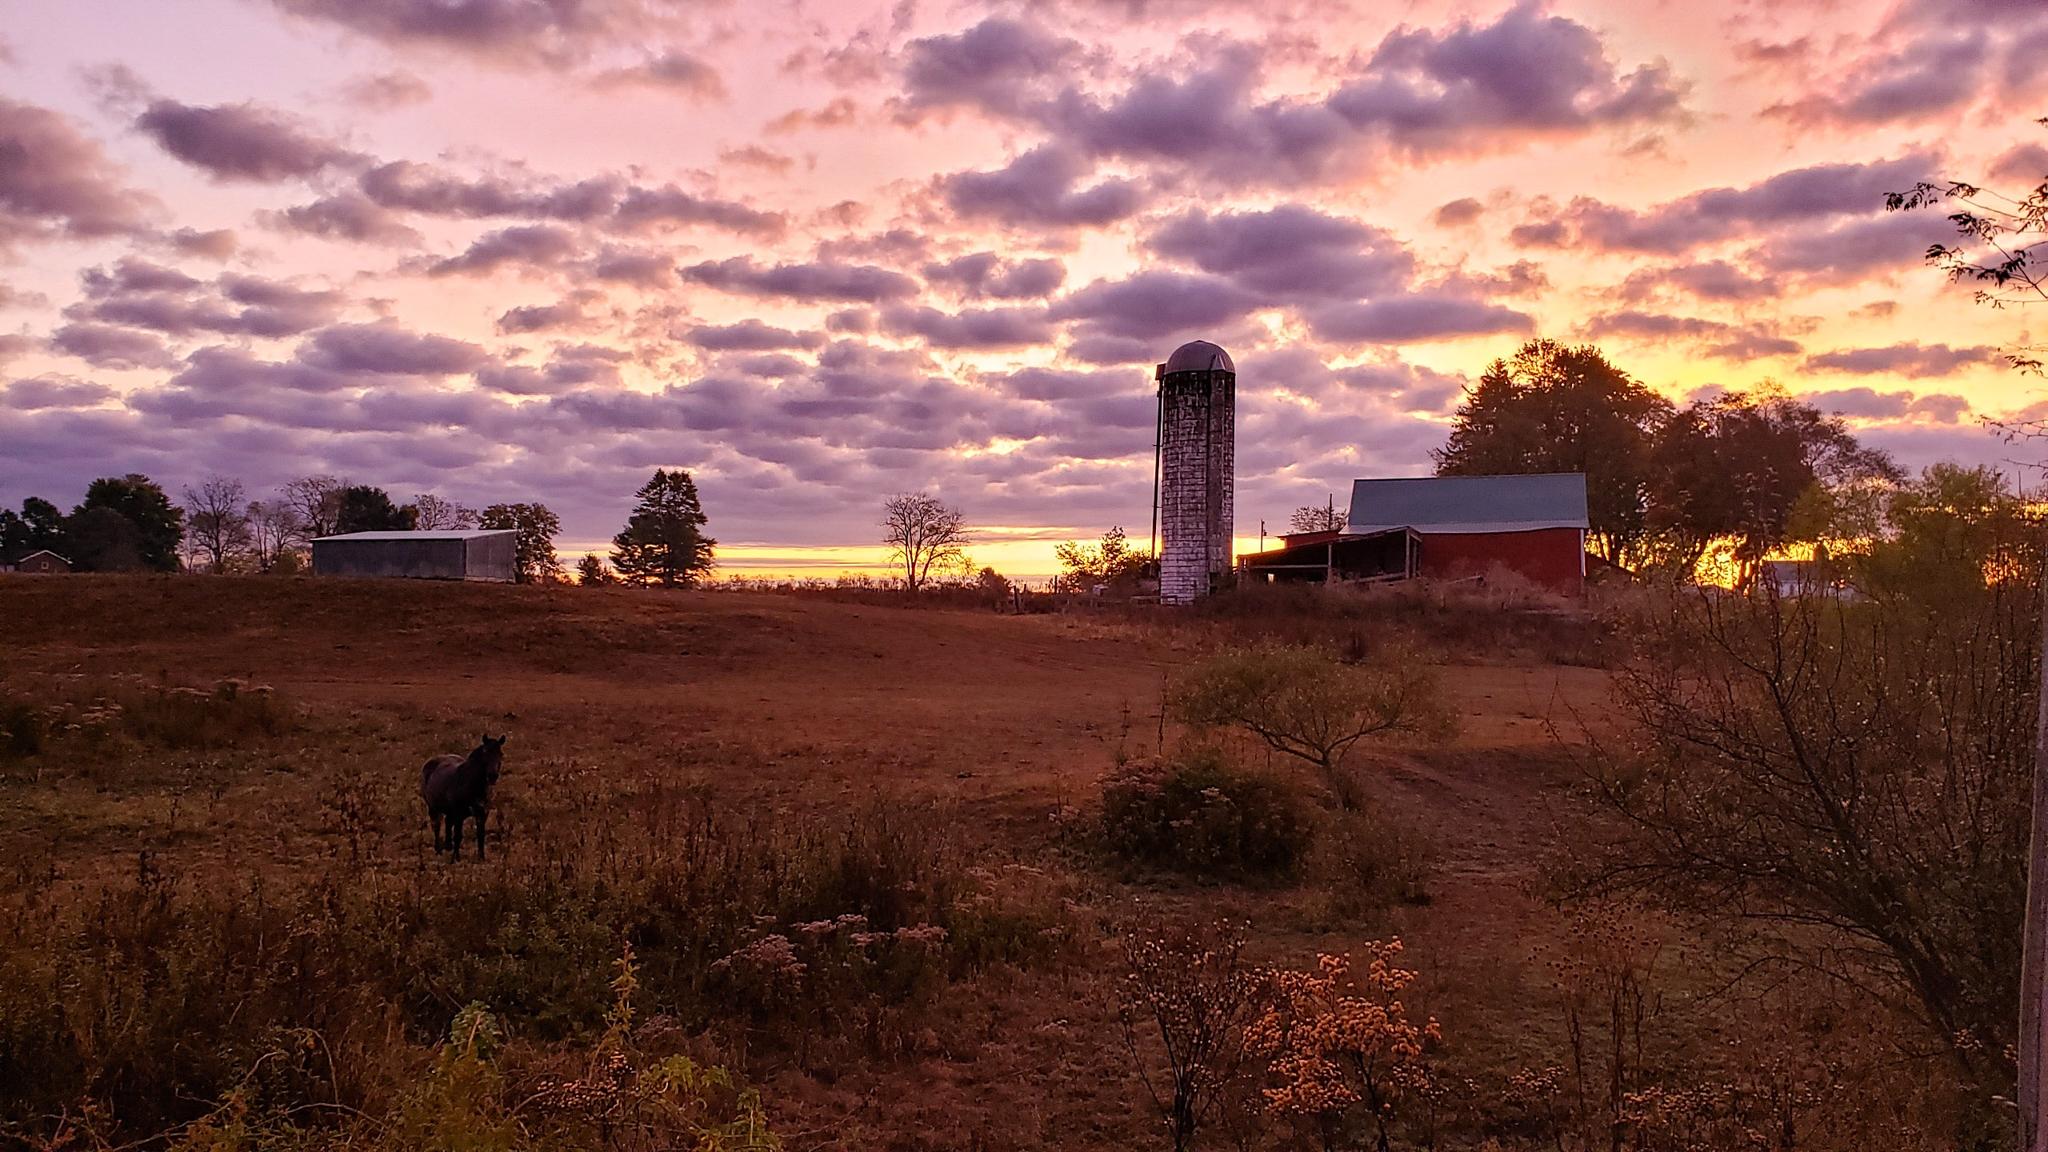 10-October-2019 Autumn sunrise on the farm